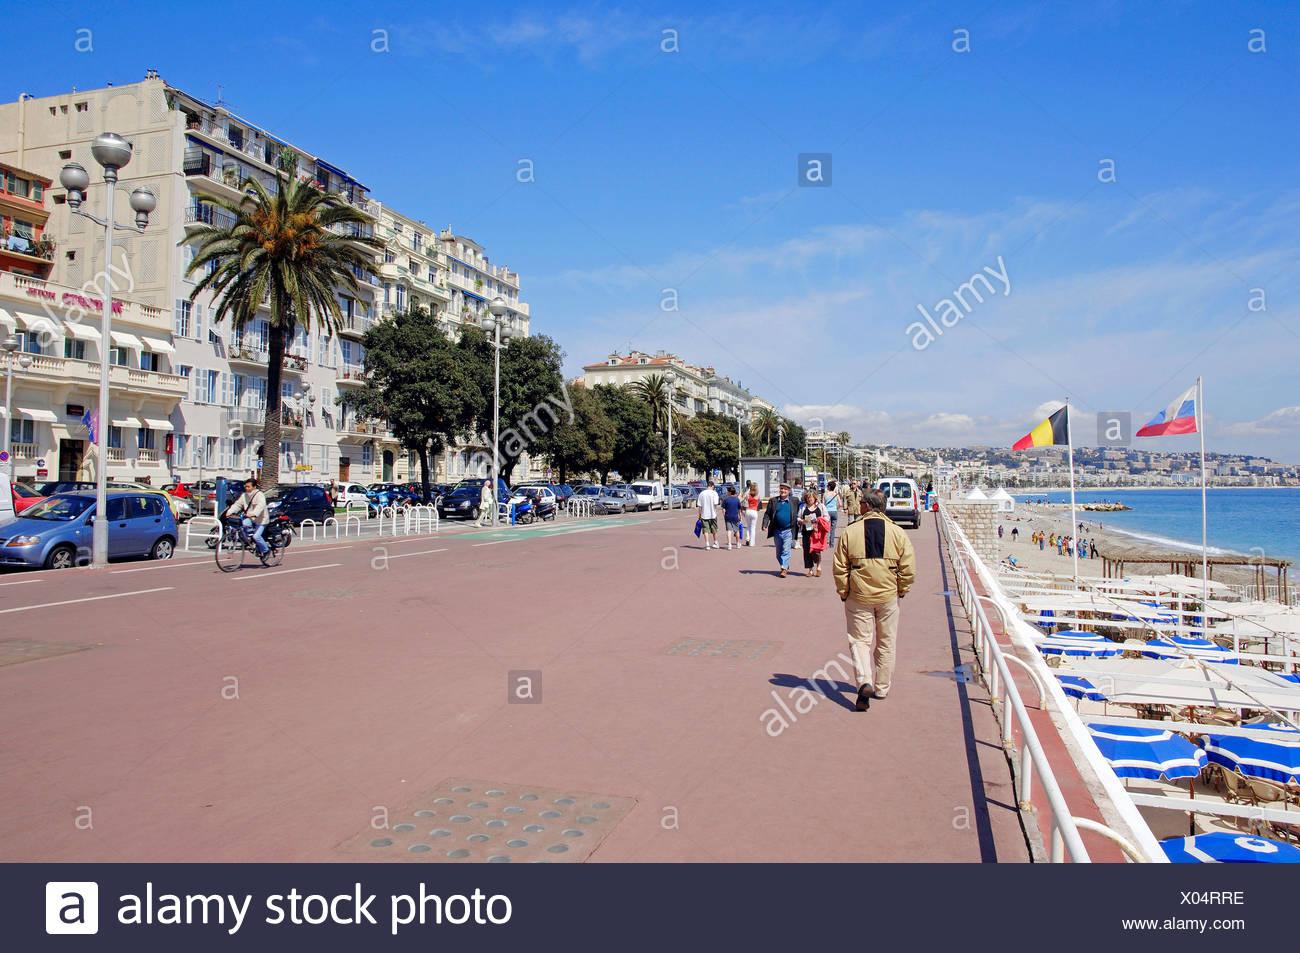 Lungomare Promenade des Anglais, Nice, Alpes-Maritimes, Provence-Alpes-Côte d'Azur, in Francia meridionale, Francia, Europa Immagini Stock